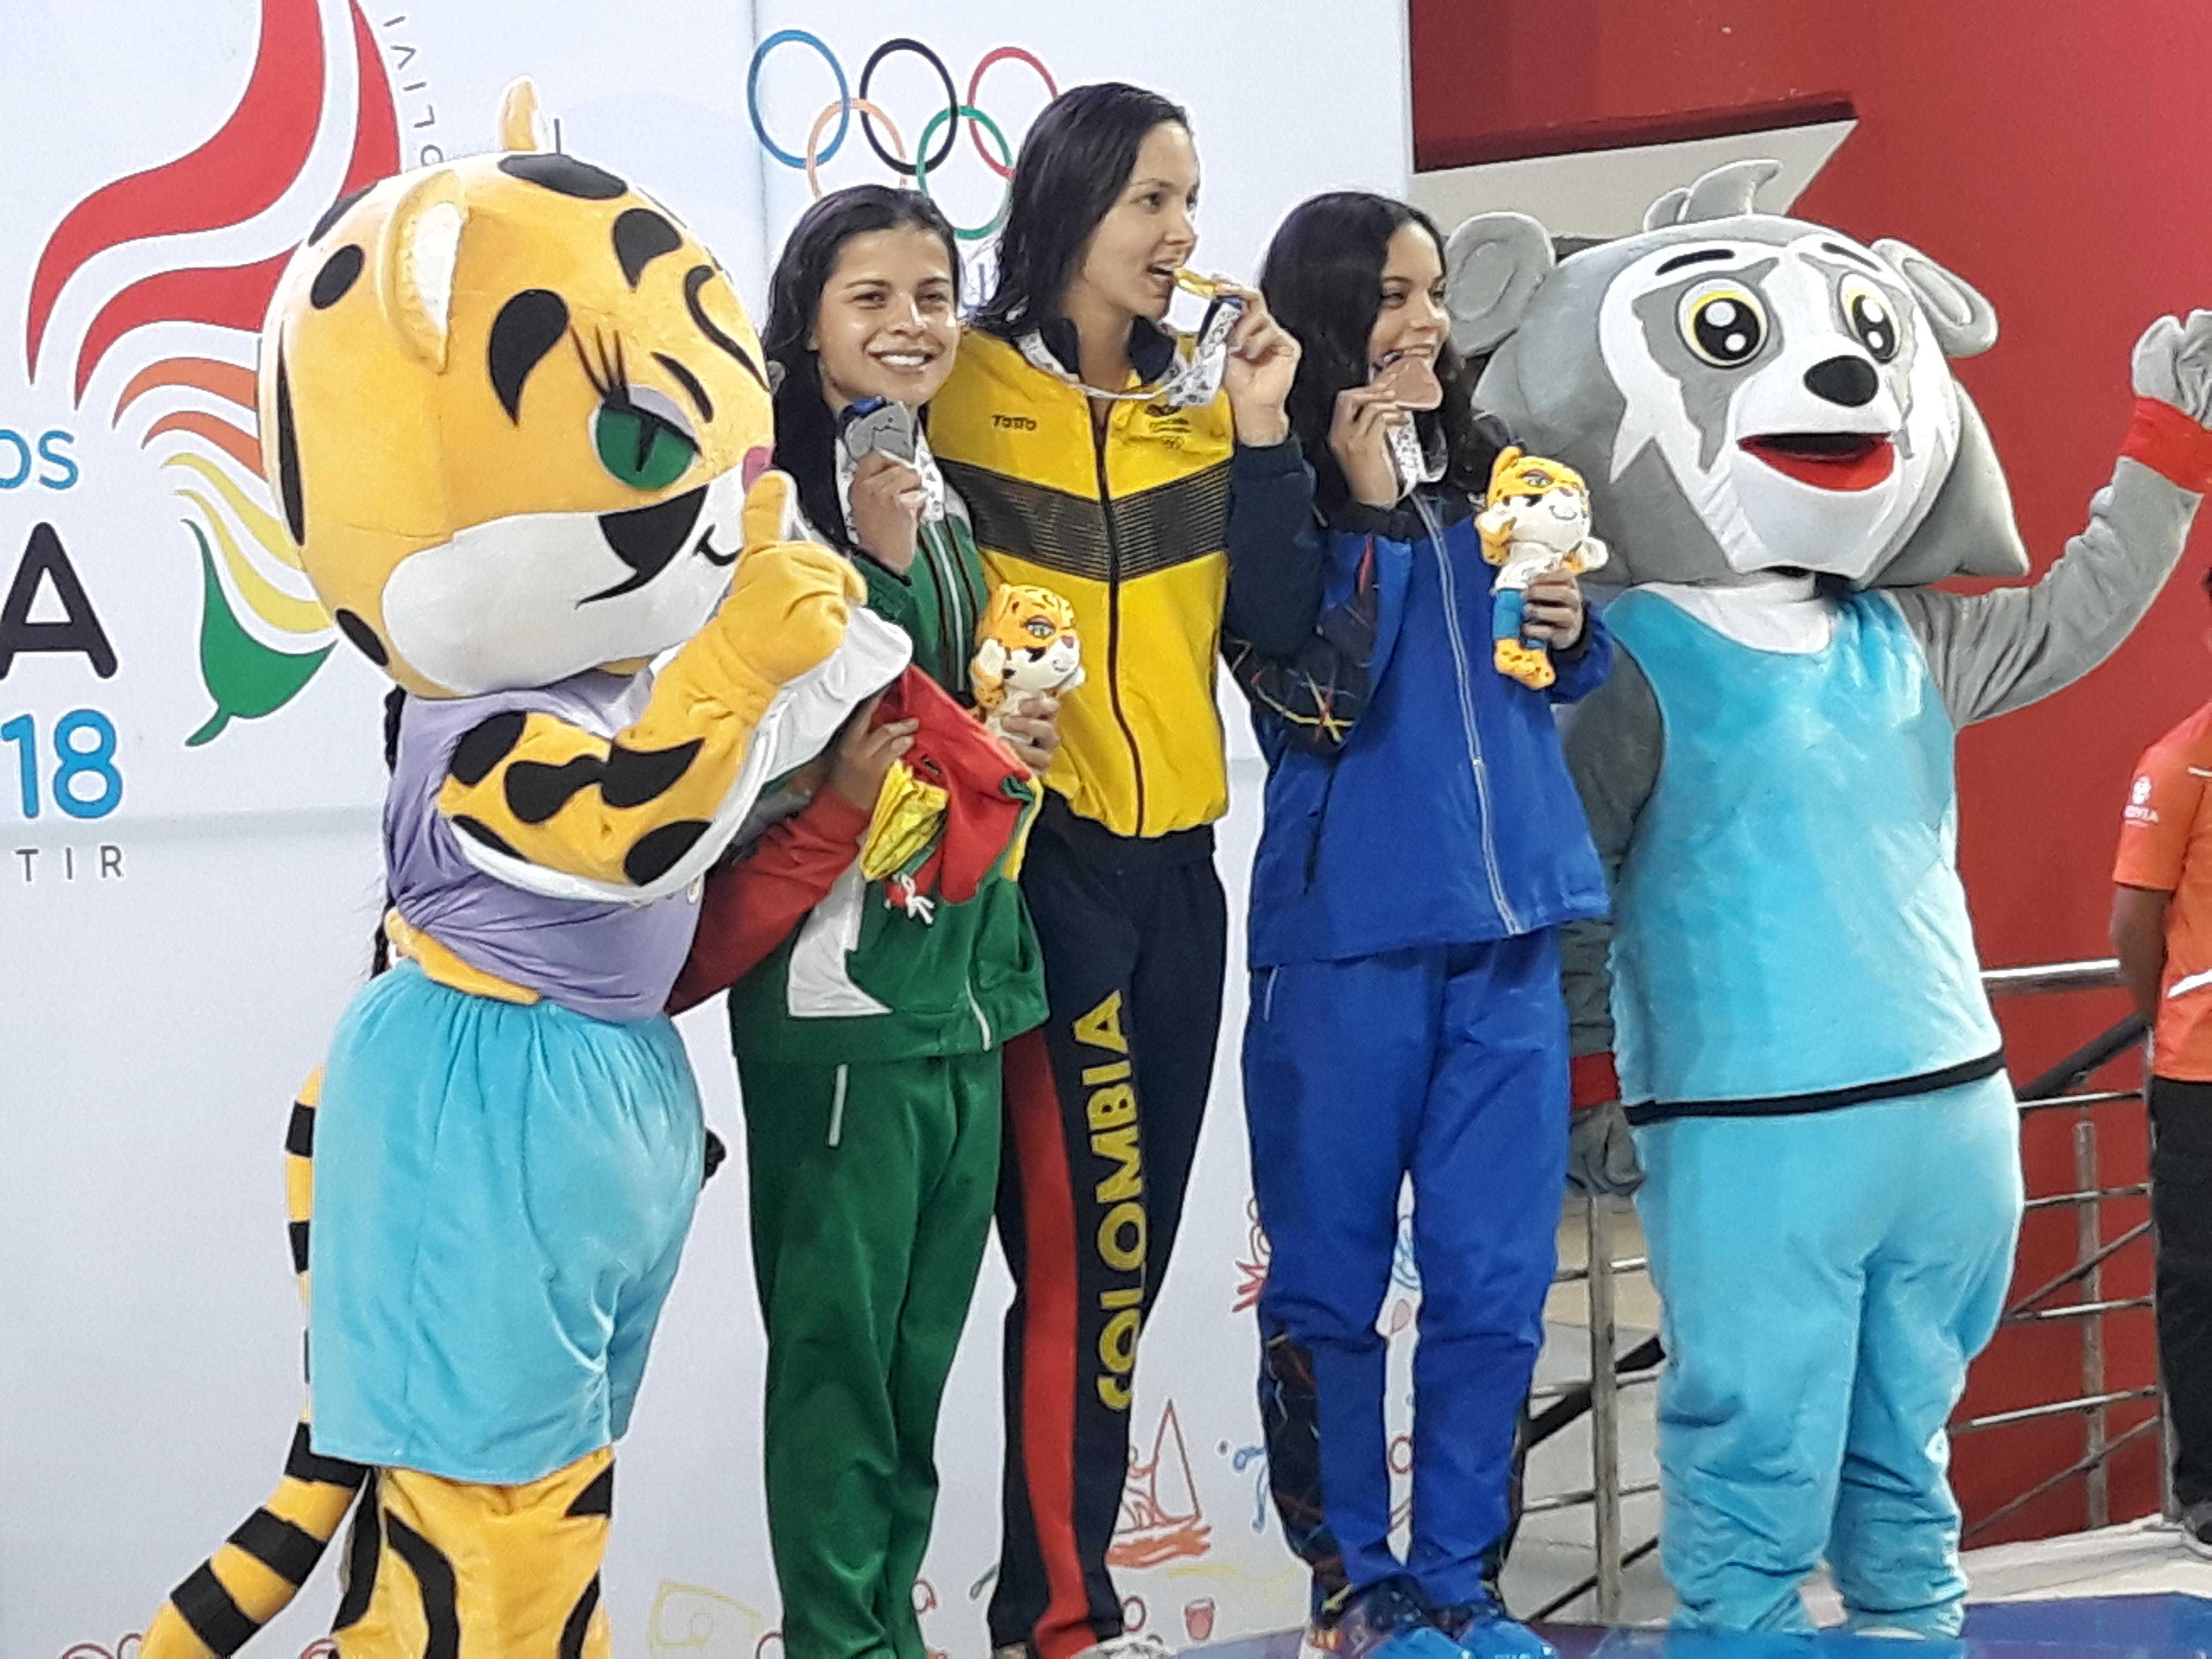 Torrez suma tres medallas de plata en los JJSS 2018